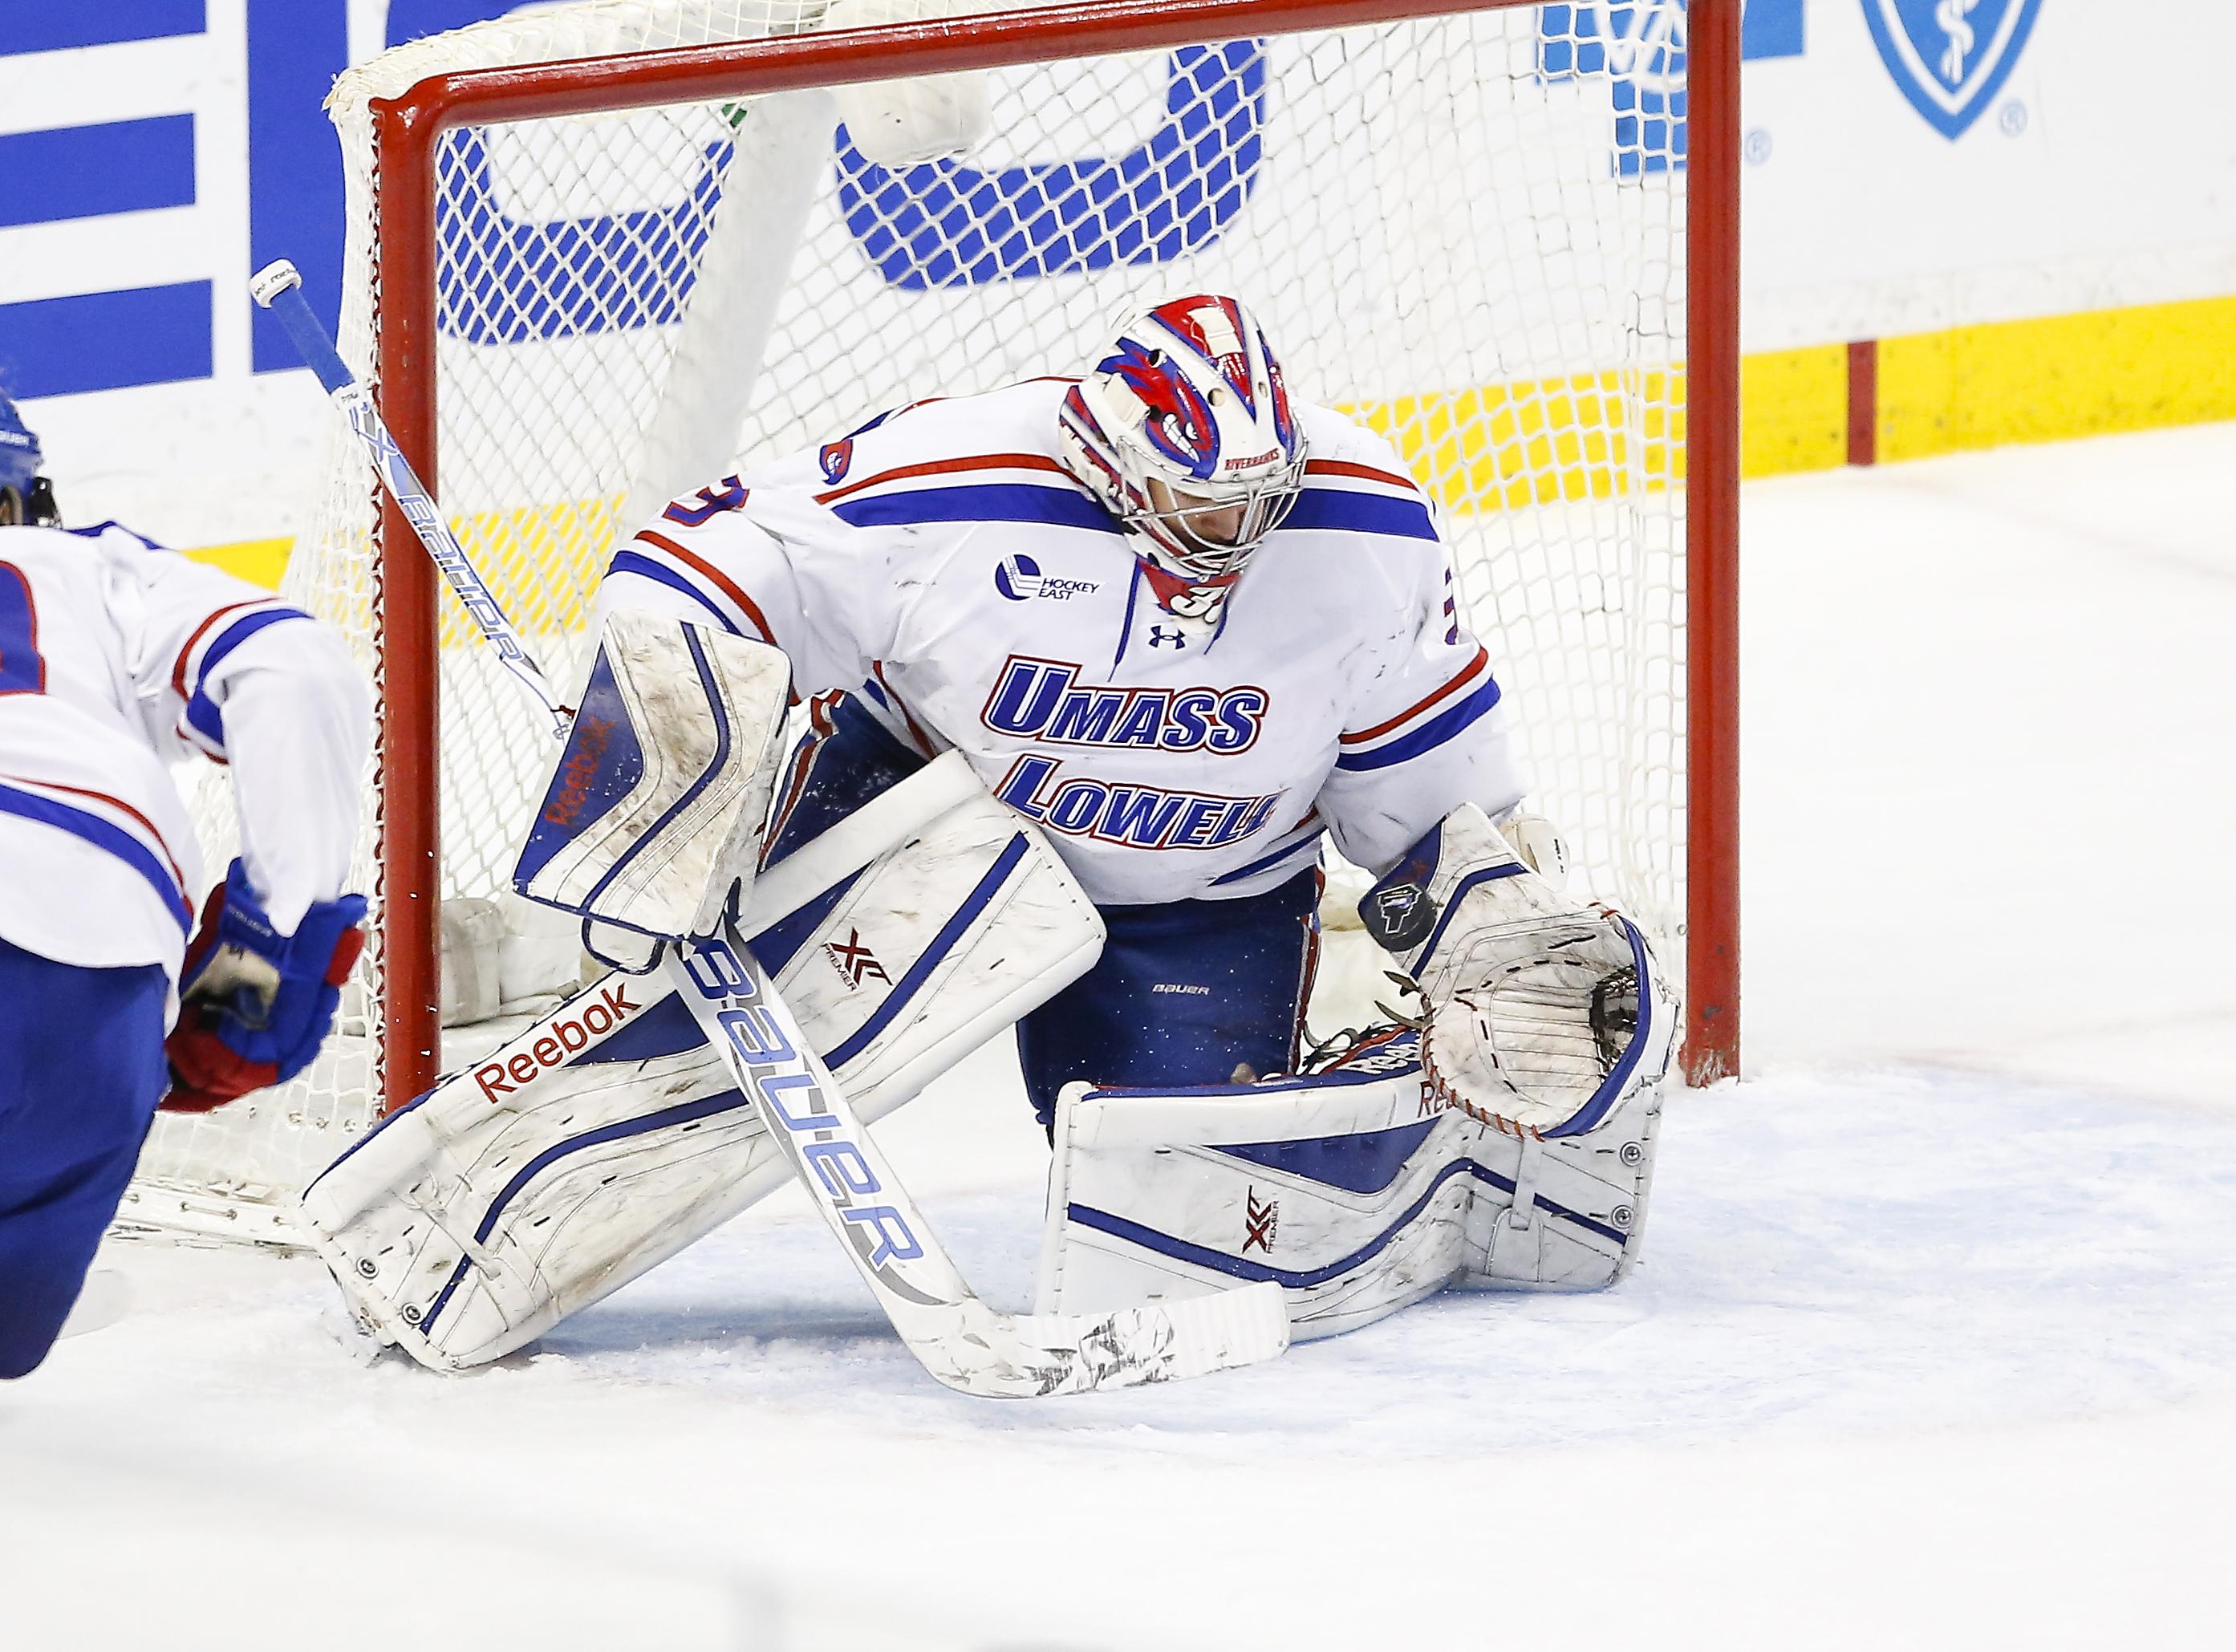 Hockey East: Weekend Preview - Friars, River Hawks Tangle In Key Series